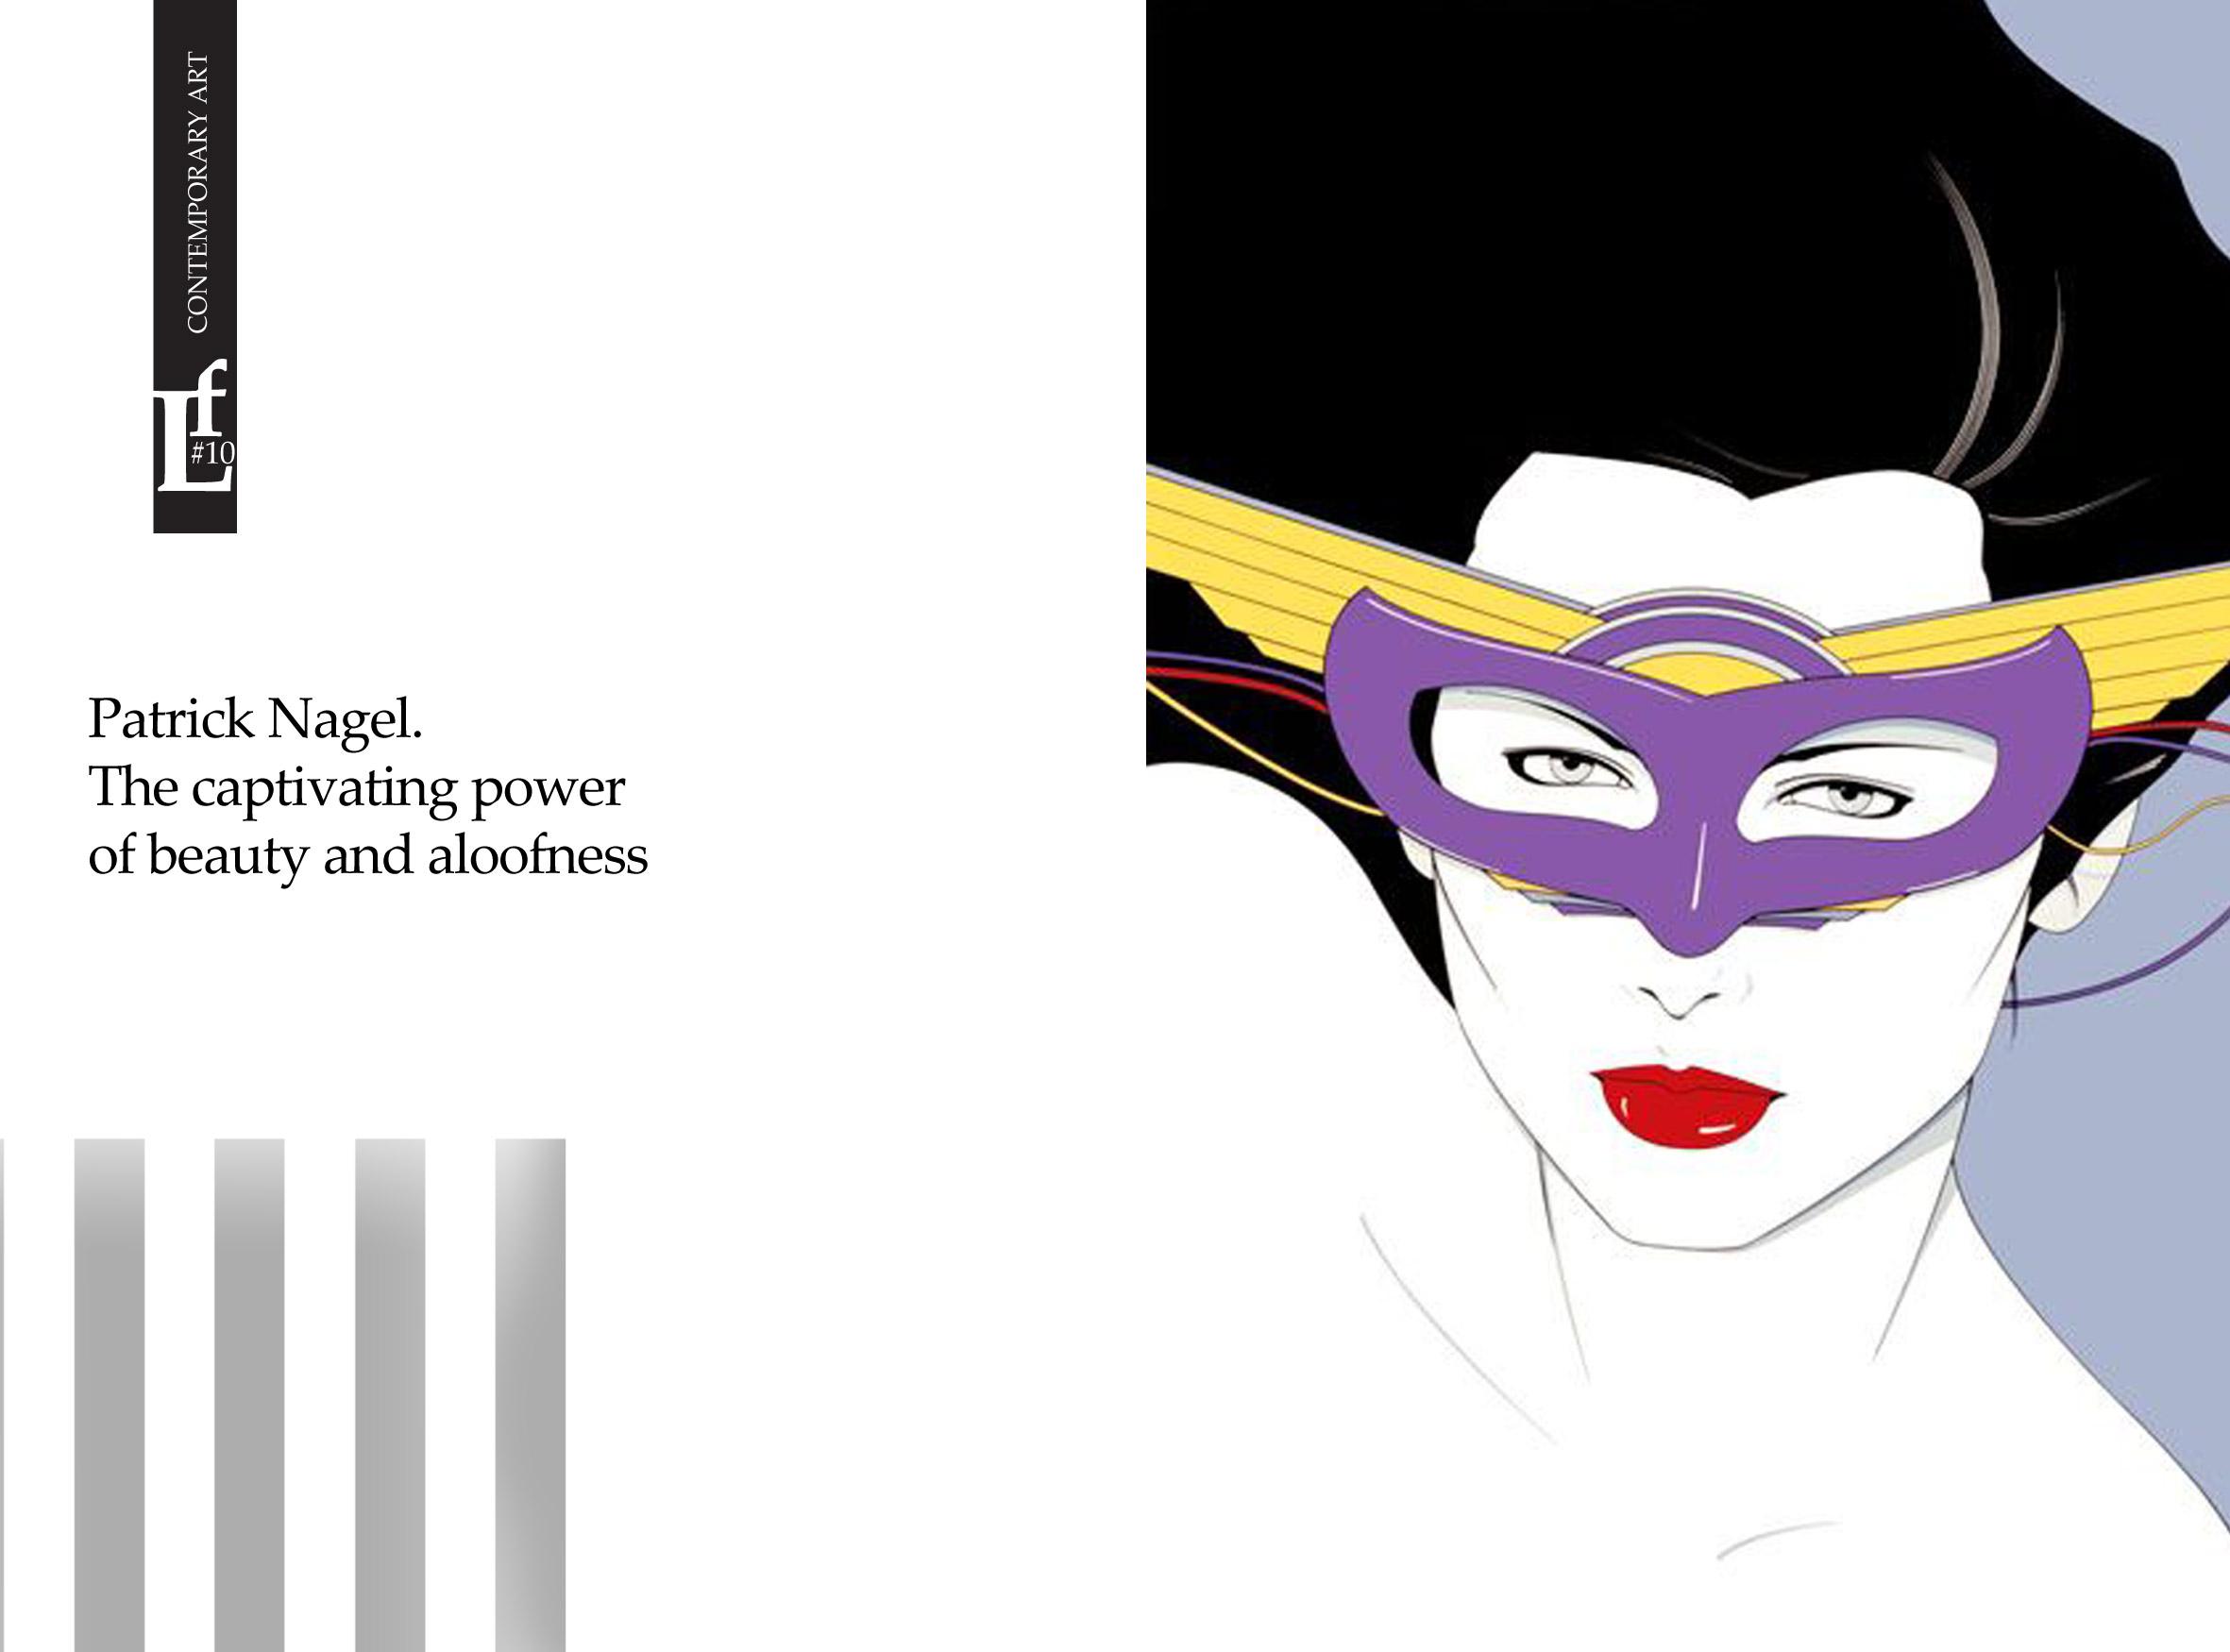 Patrick Nagel. The captivating power of beauty and aloofness | La ...